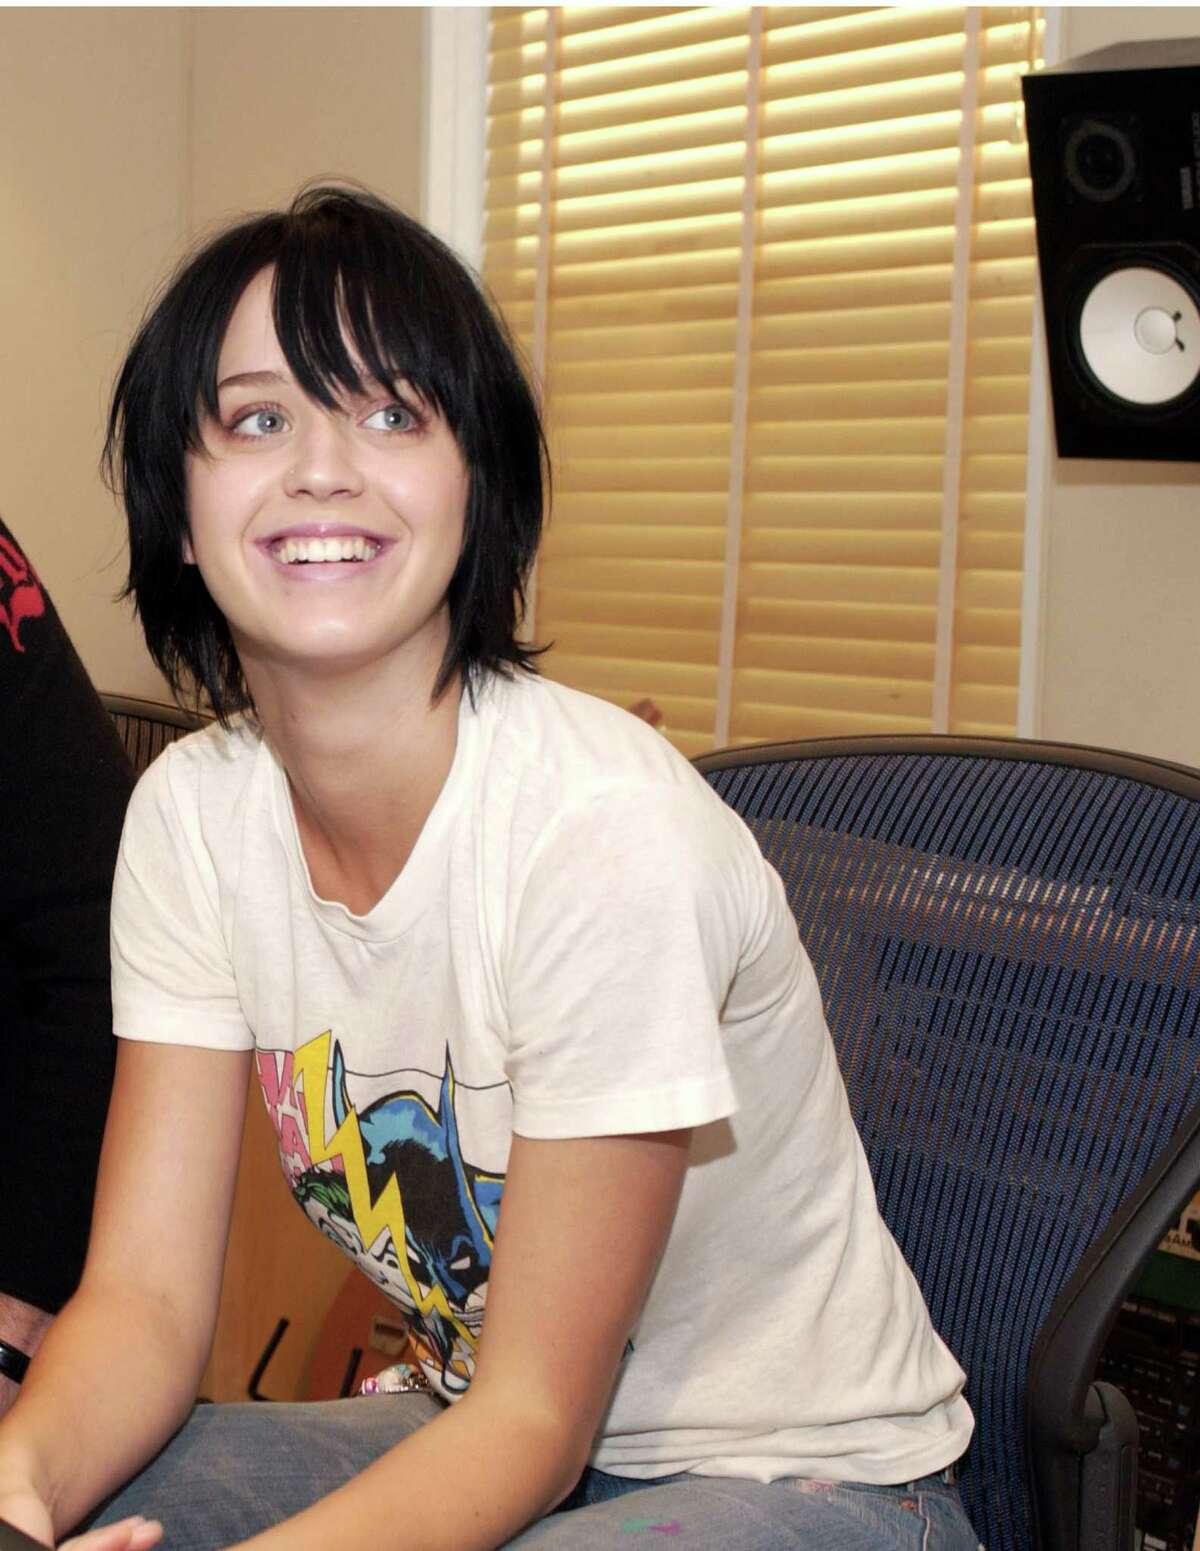 Katy Perry in 2002, when she was still sort of known as Katy Hudson. (Birth name: Katheryn Elizabeth Hudson).